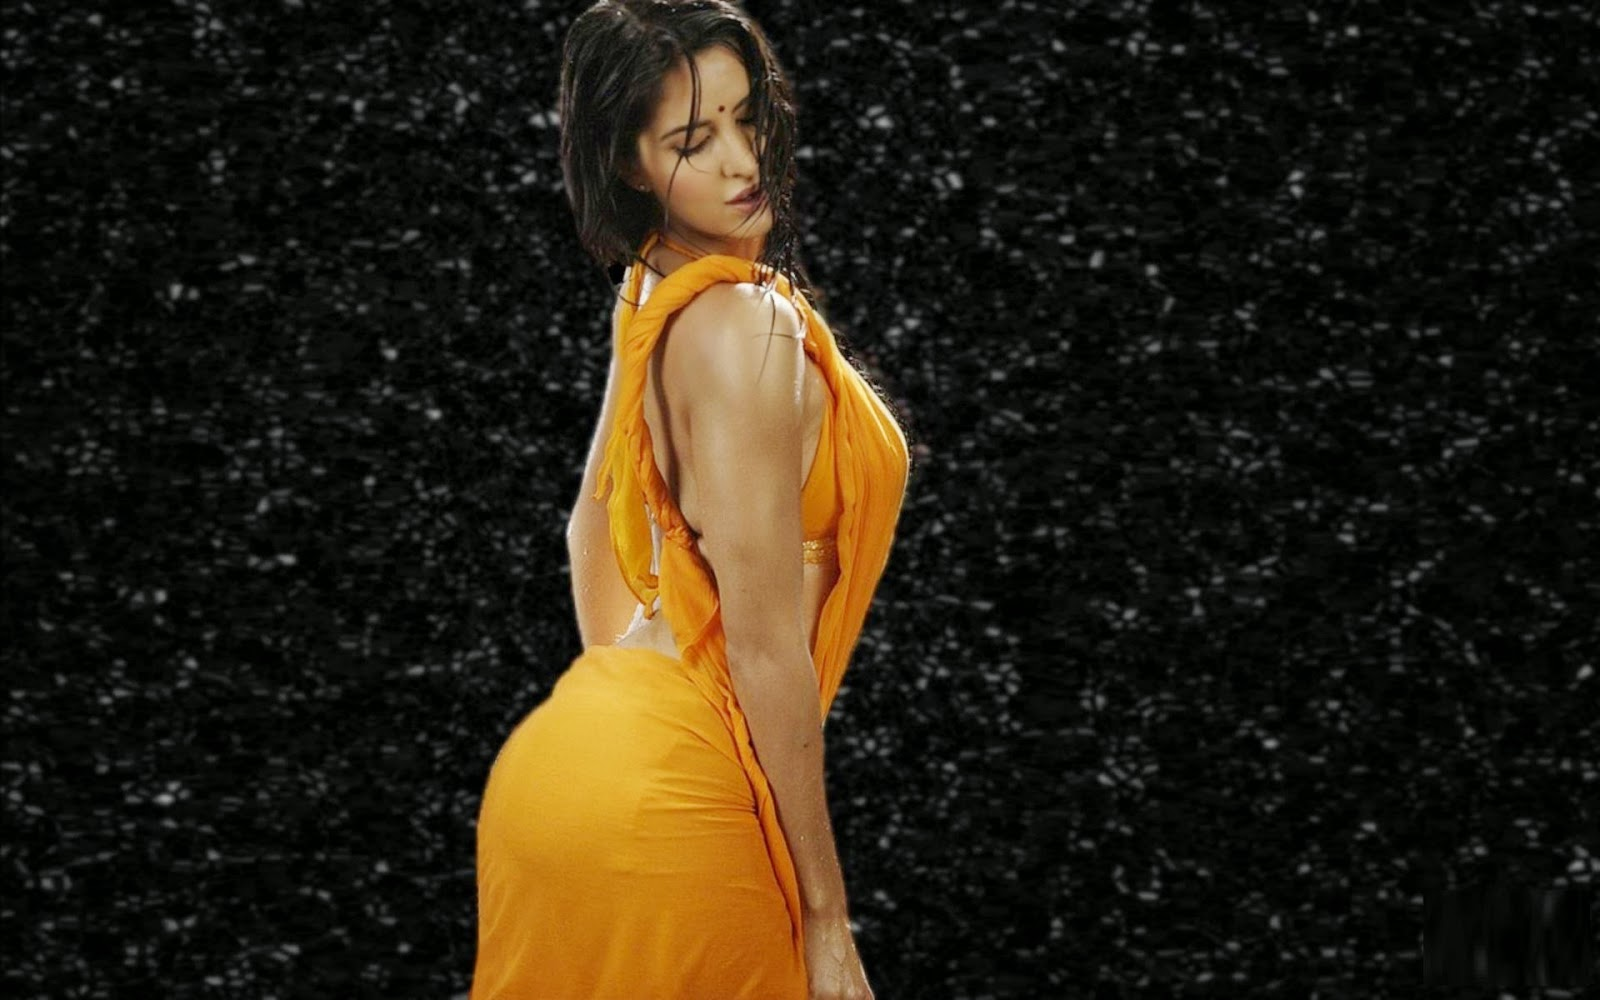 katrina kaif hot picture gallery | beautifulx